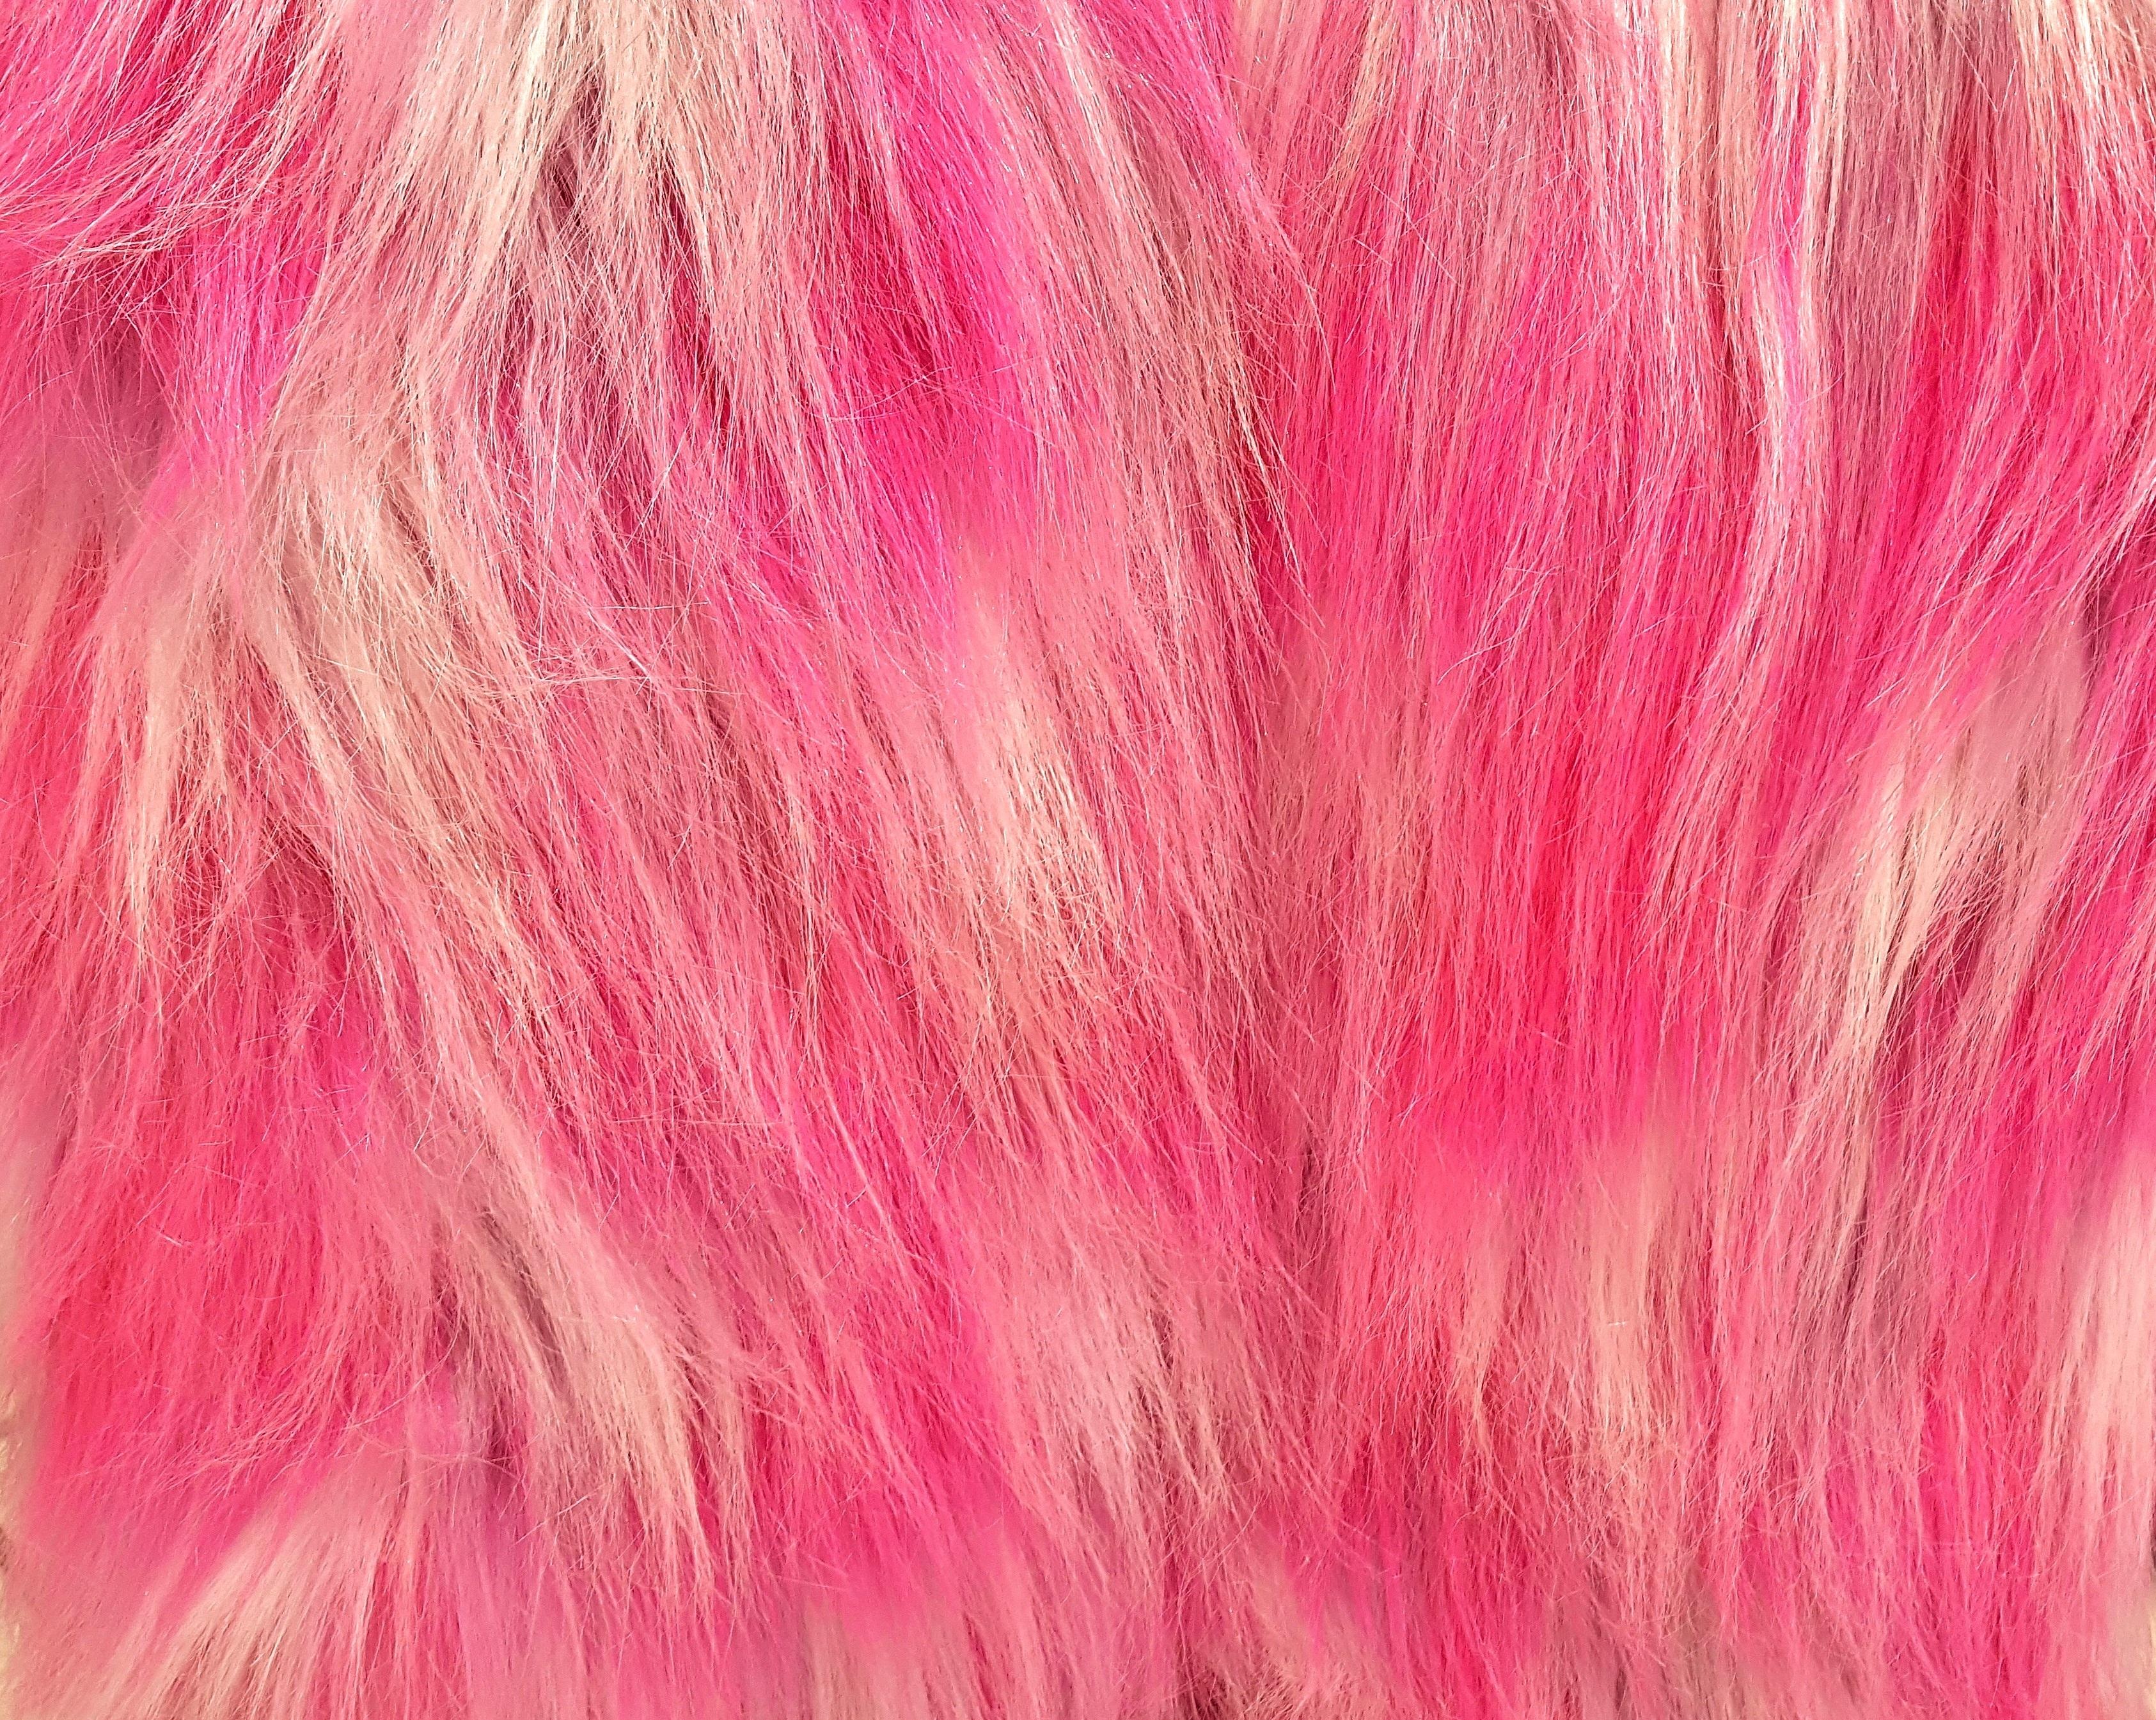 Fotos gratis : cabello, textura, púrpura, pétalo, hembra, pelaje ...